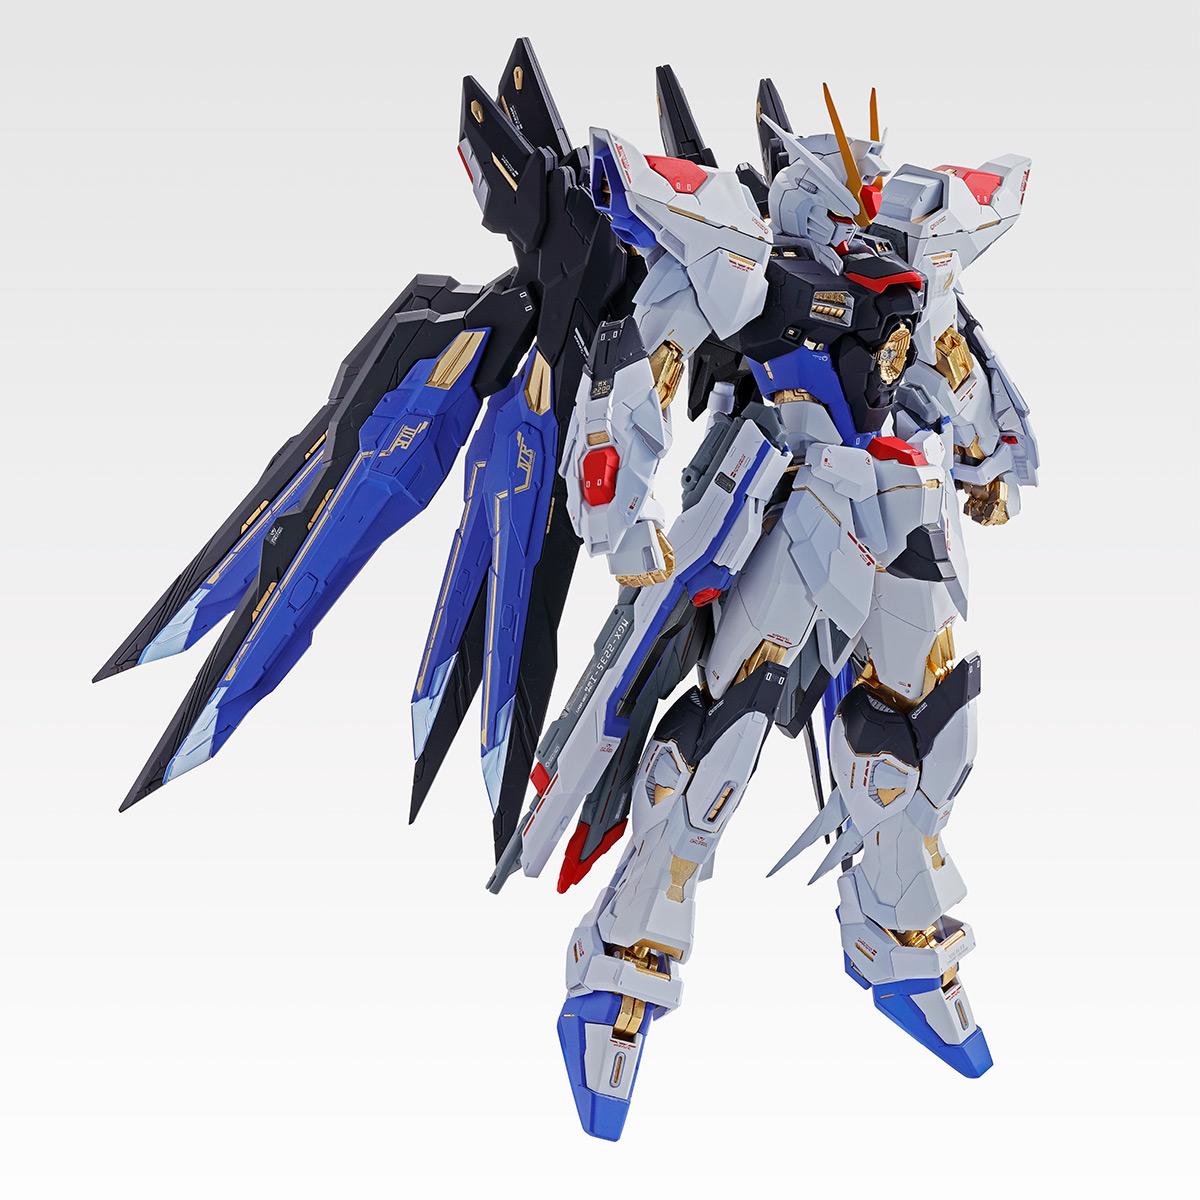 METAL BUILD STRIKE FREEDOM GUNDAM SOUL BLUE Ver.【Second Offer】